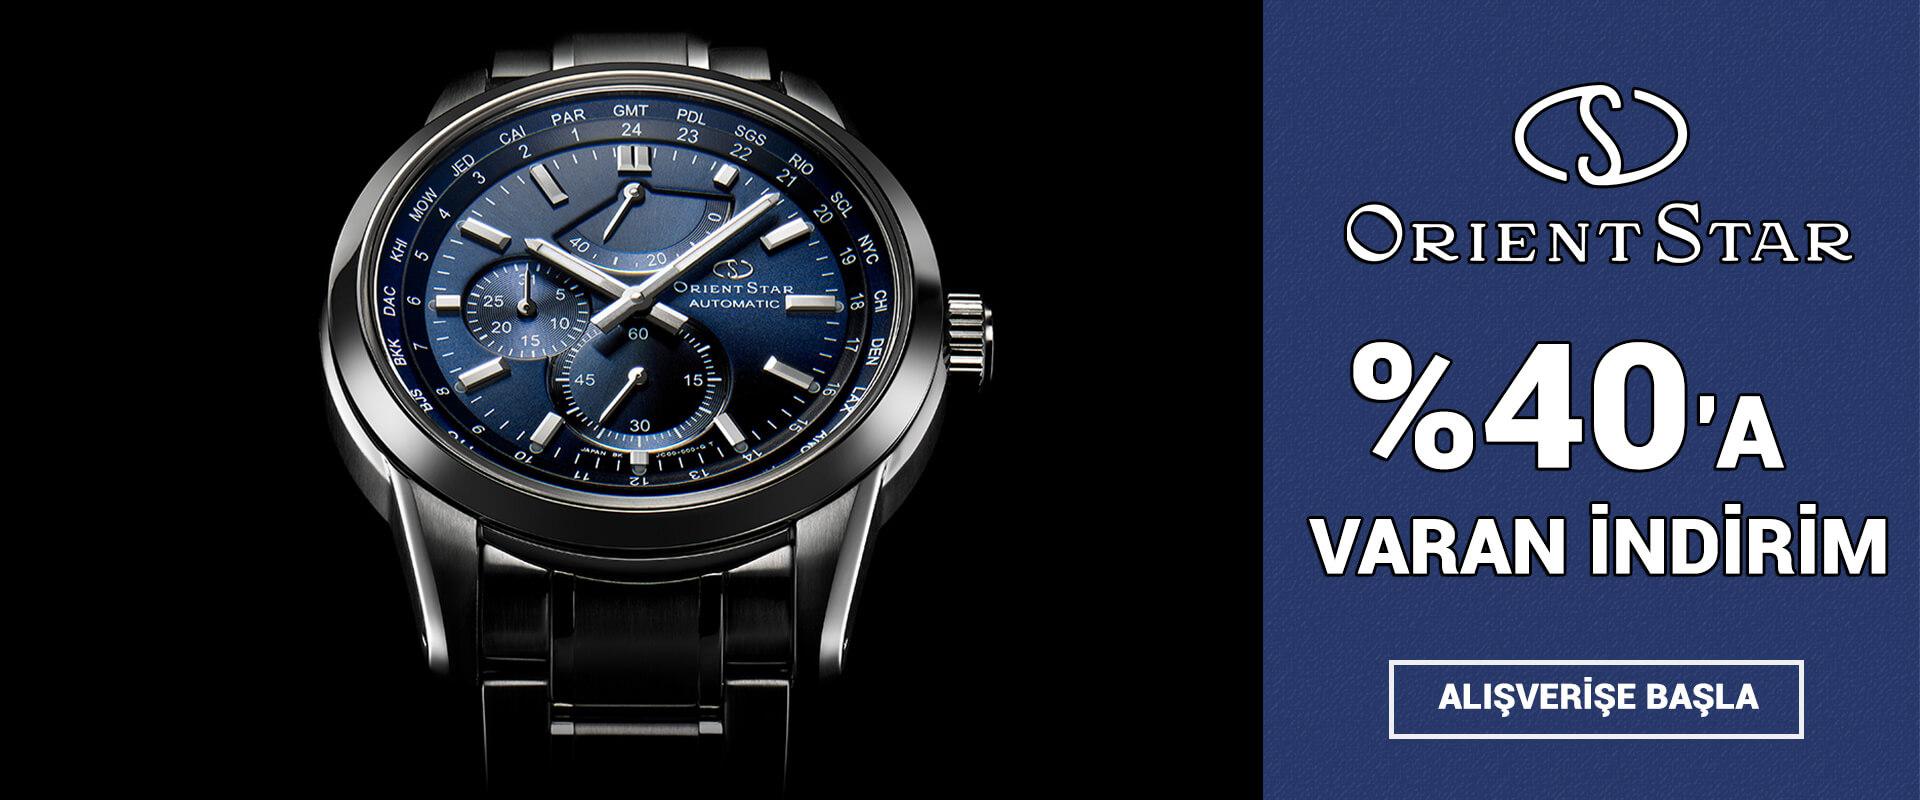 Orient Star Saat Modelleri %40'a Varan İndirim